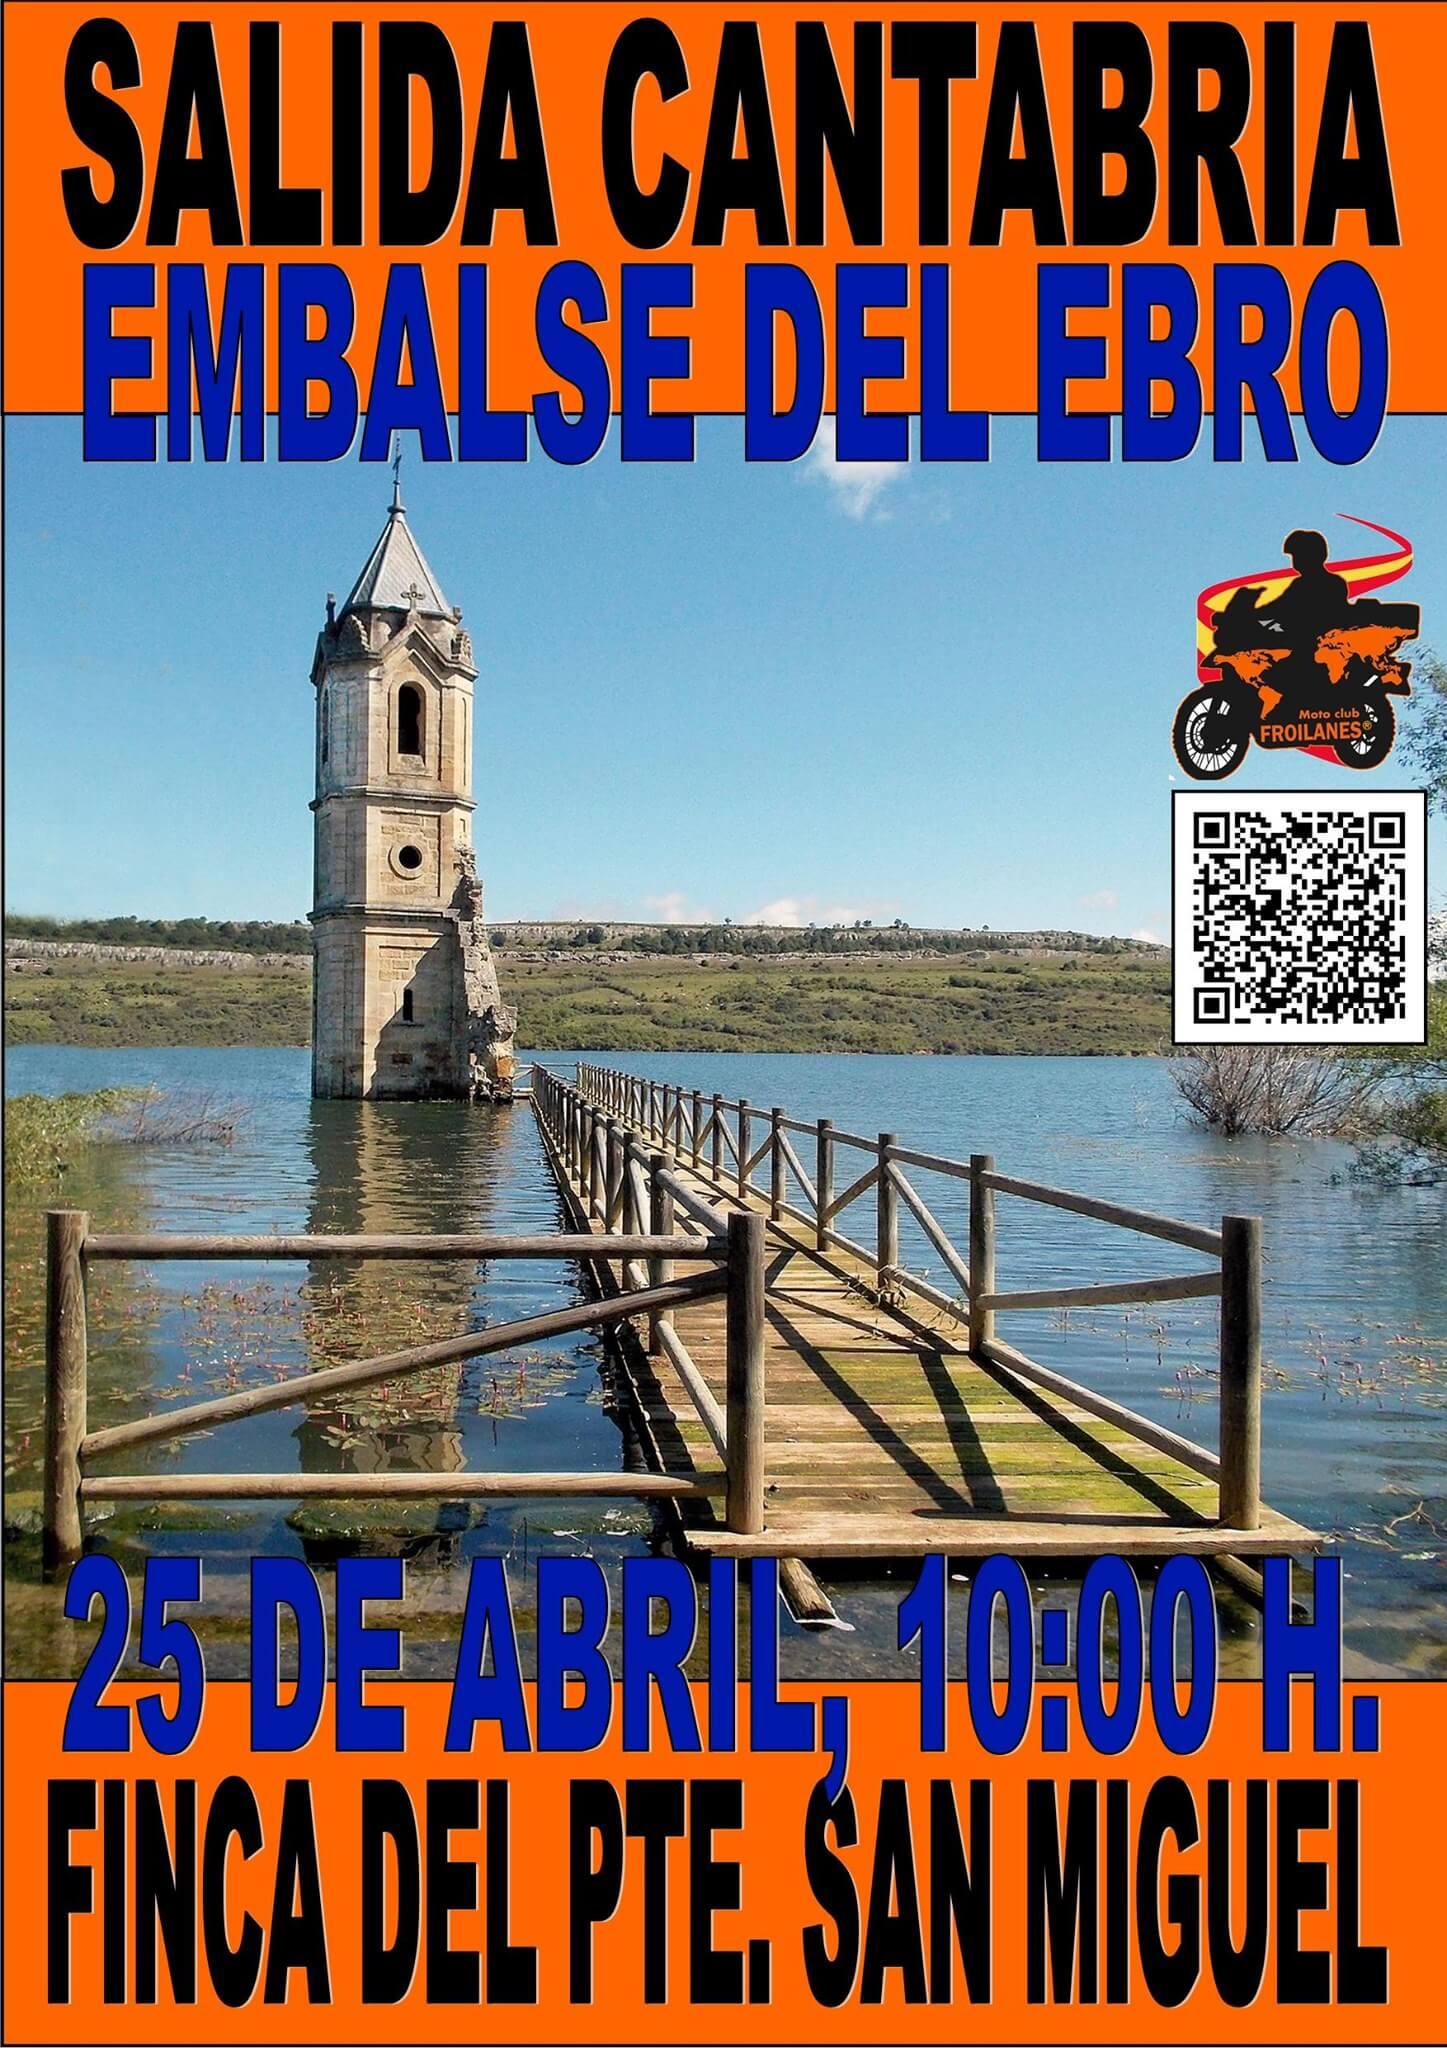 ruta motera en Cantabria